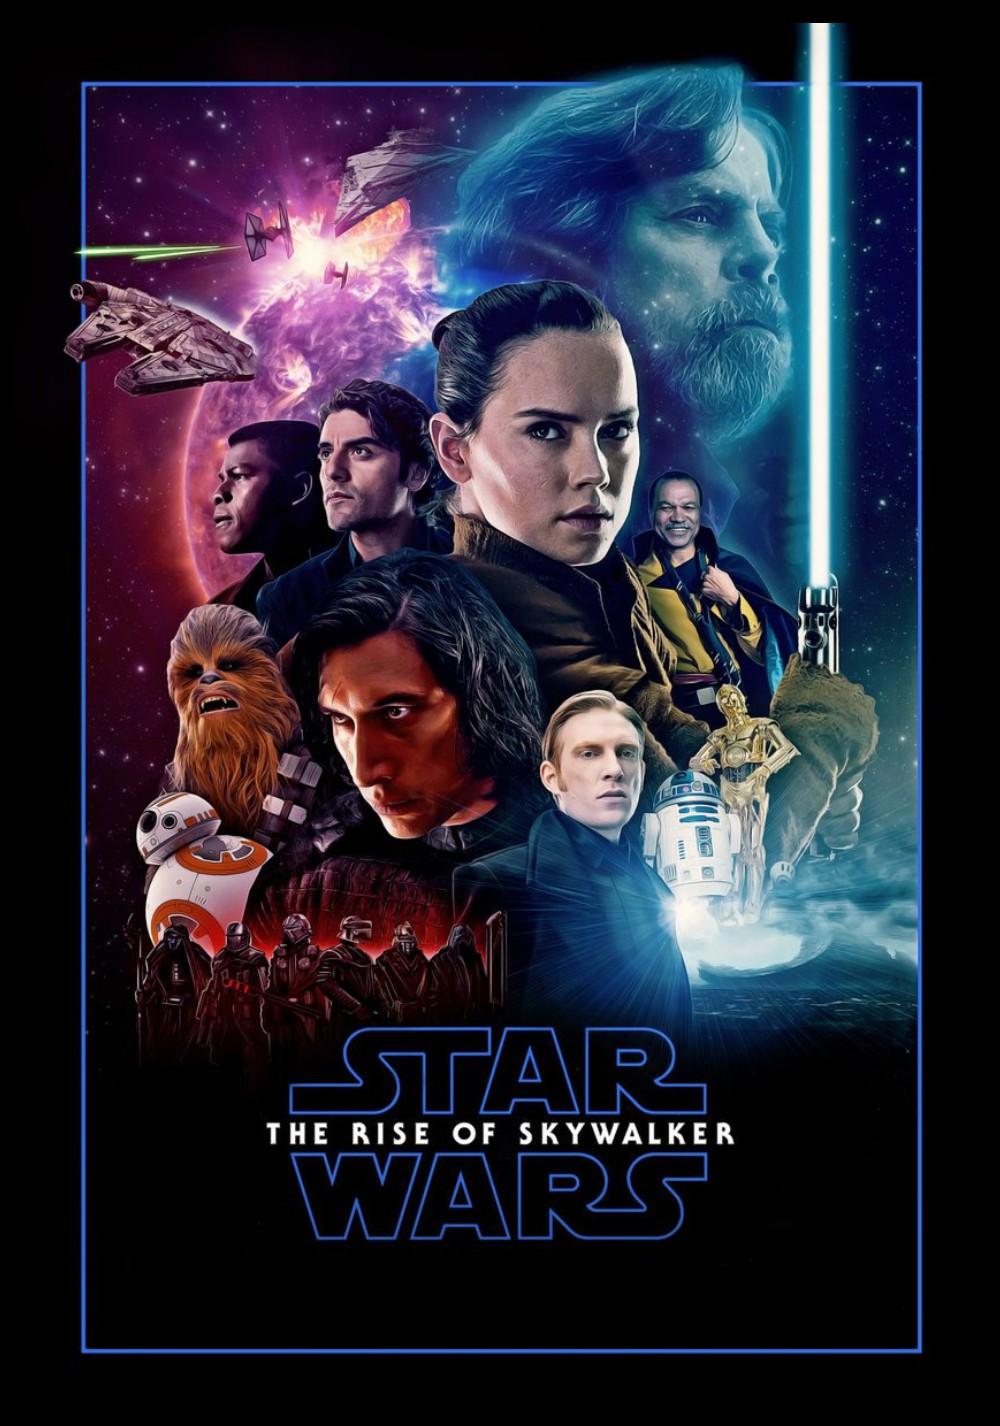 the last Star Wars movie